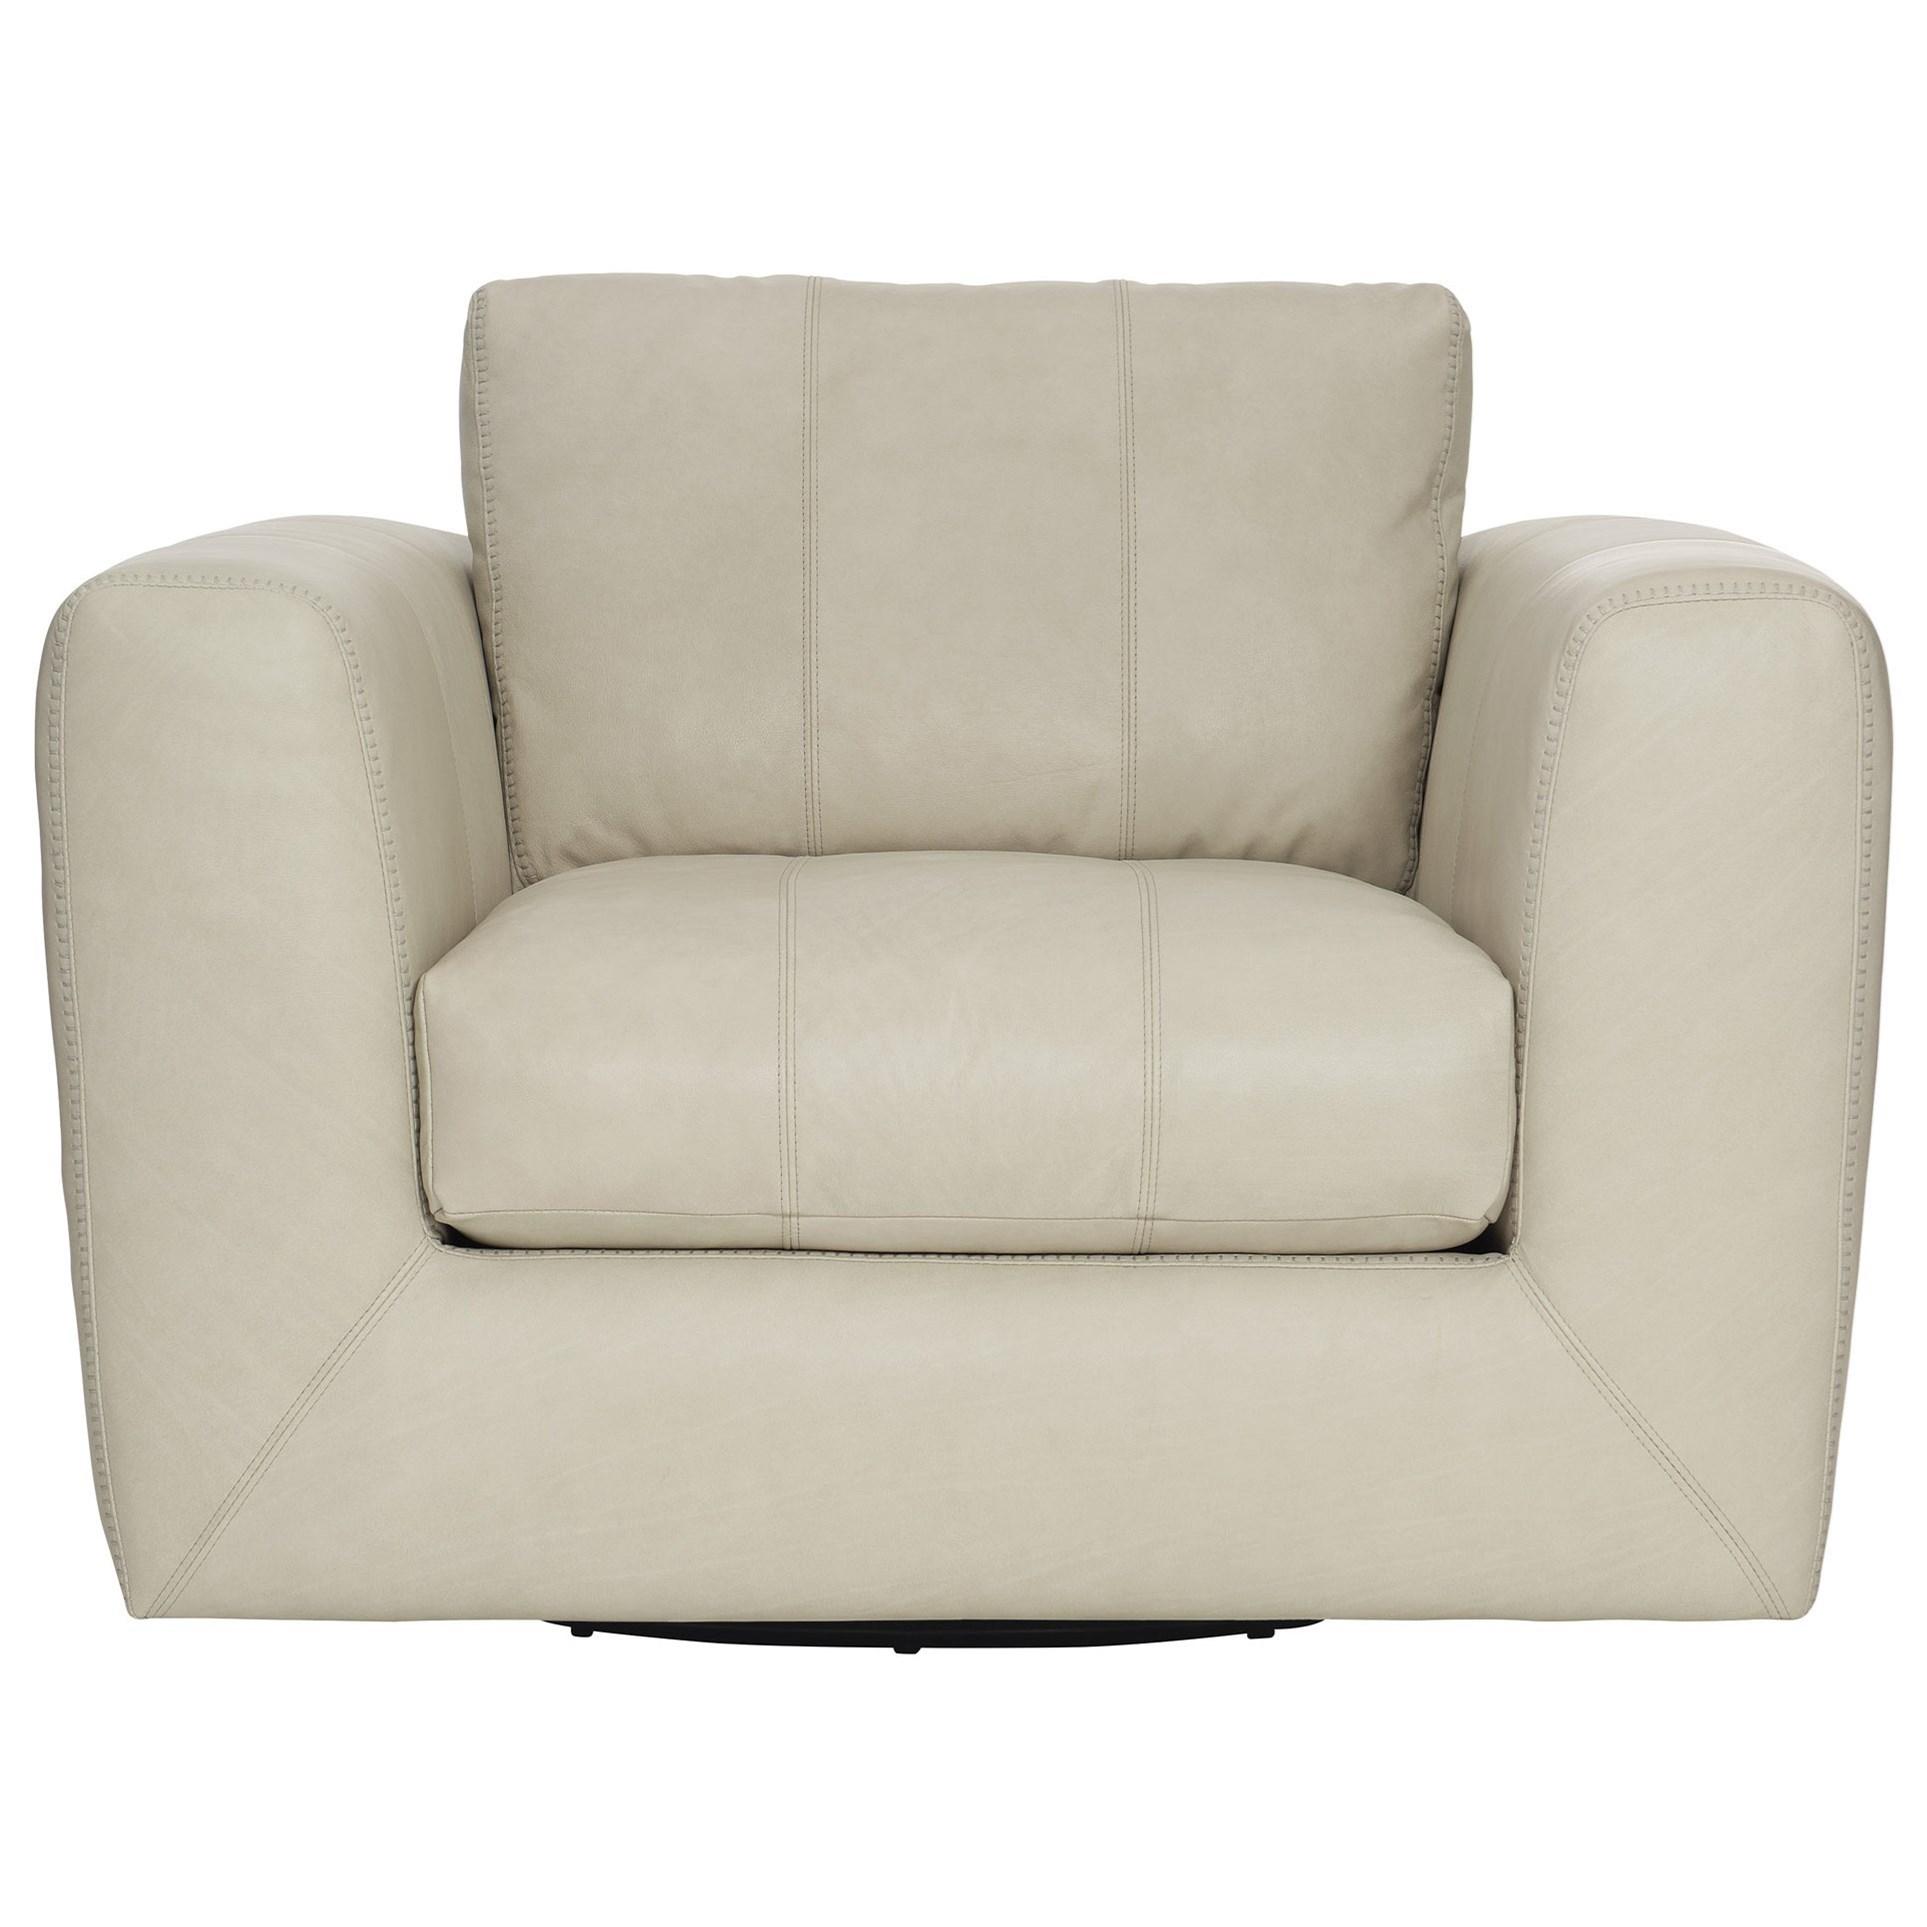 Remi Swivel Chair at Williams & Kay